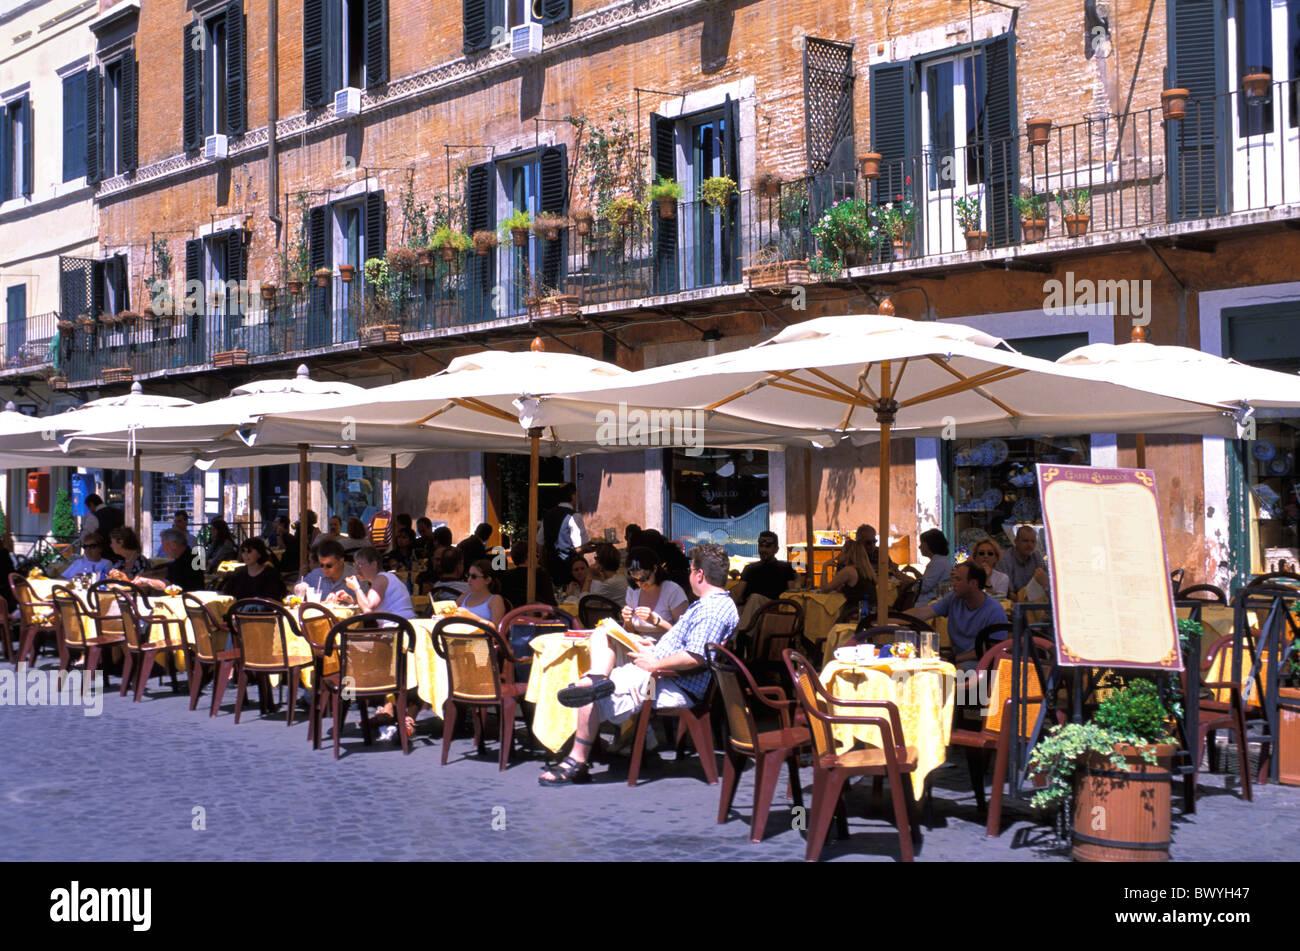 La Piazza Cafe Restaurant